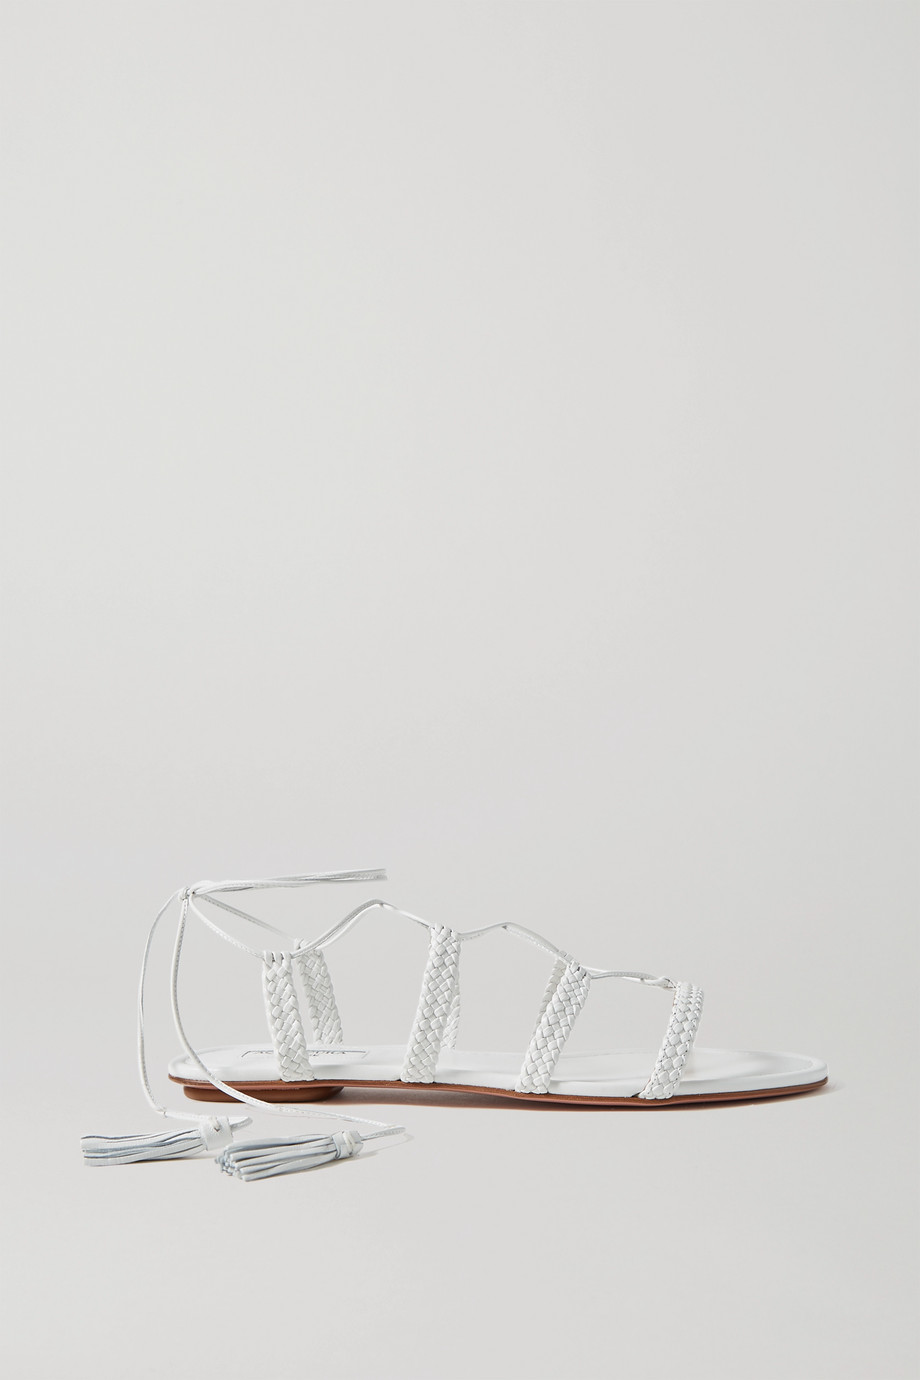 Aquazzura Stromboli 麻花编织皮革凉鞋